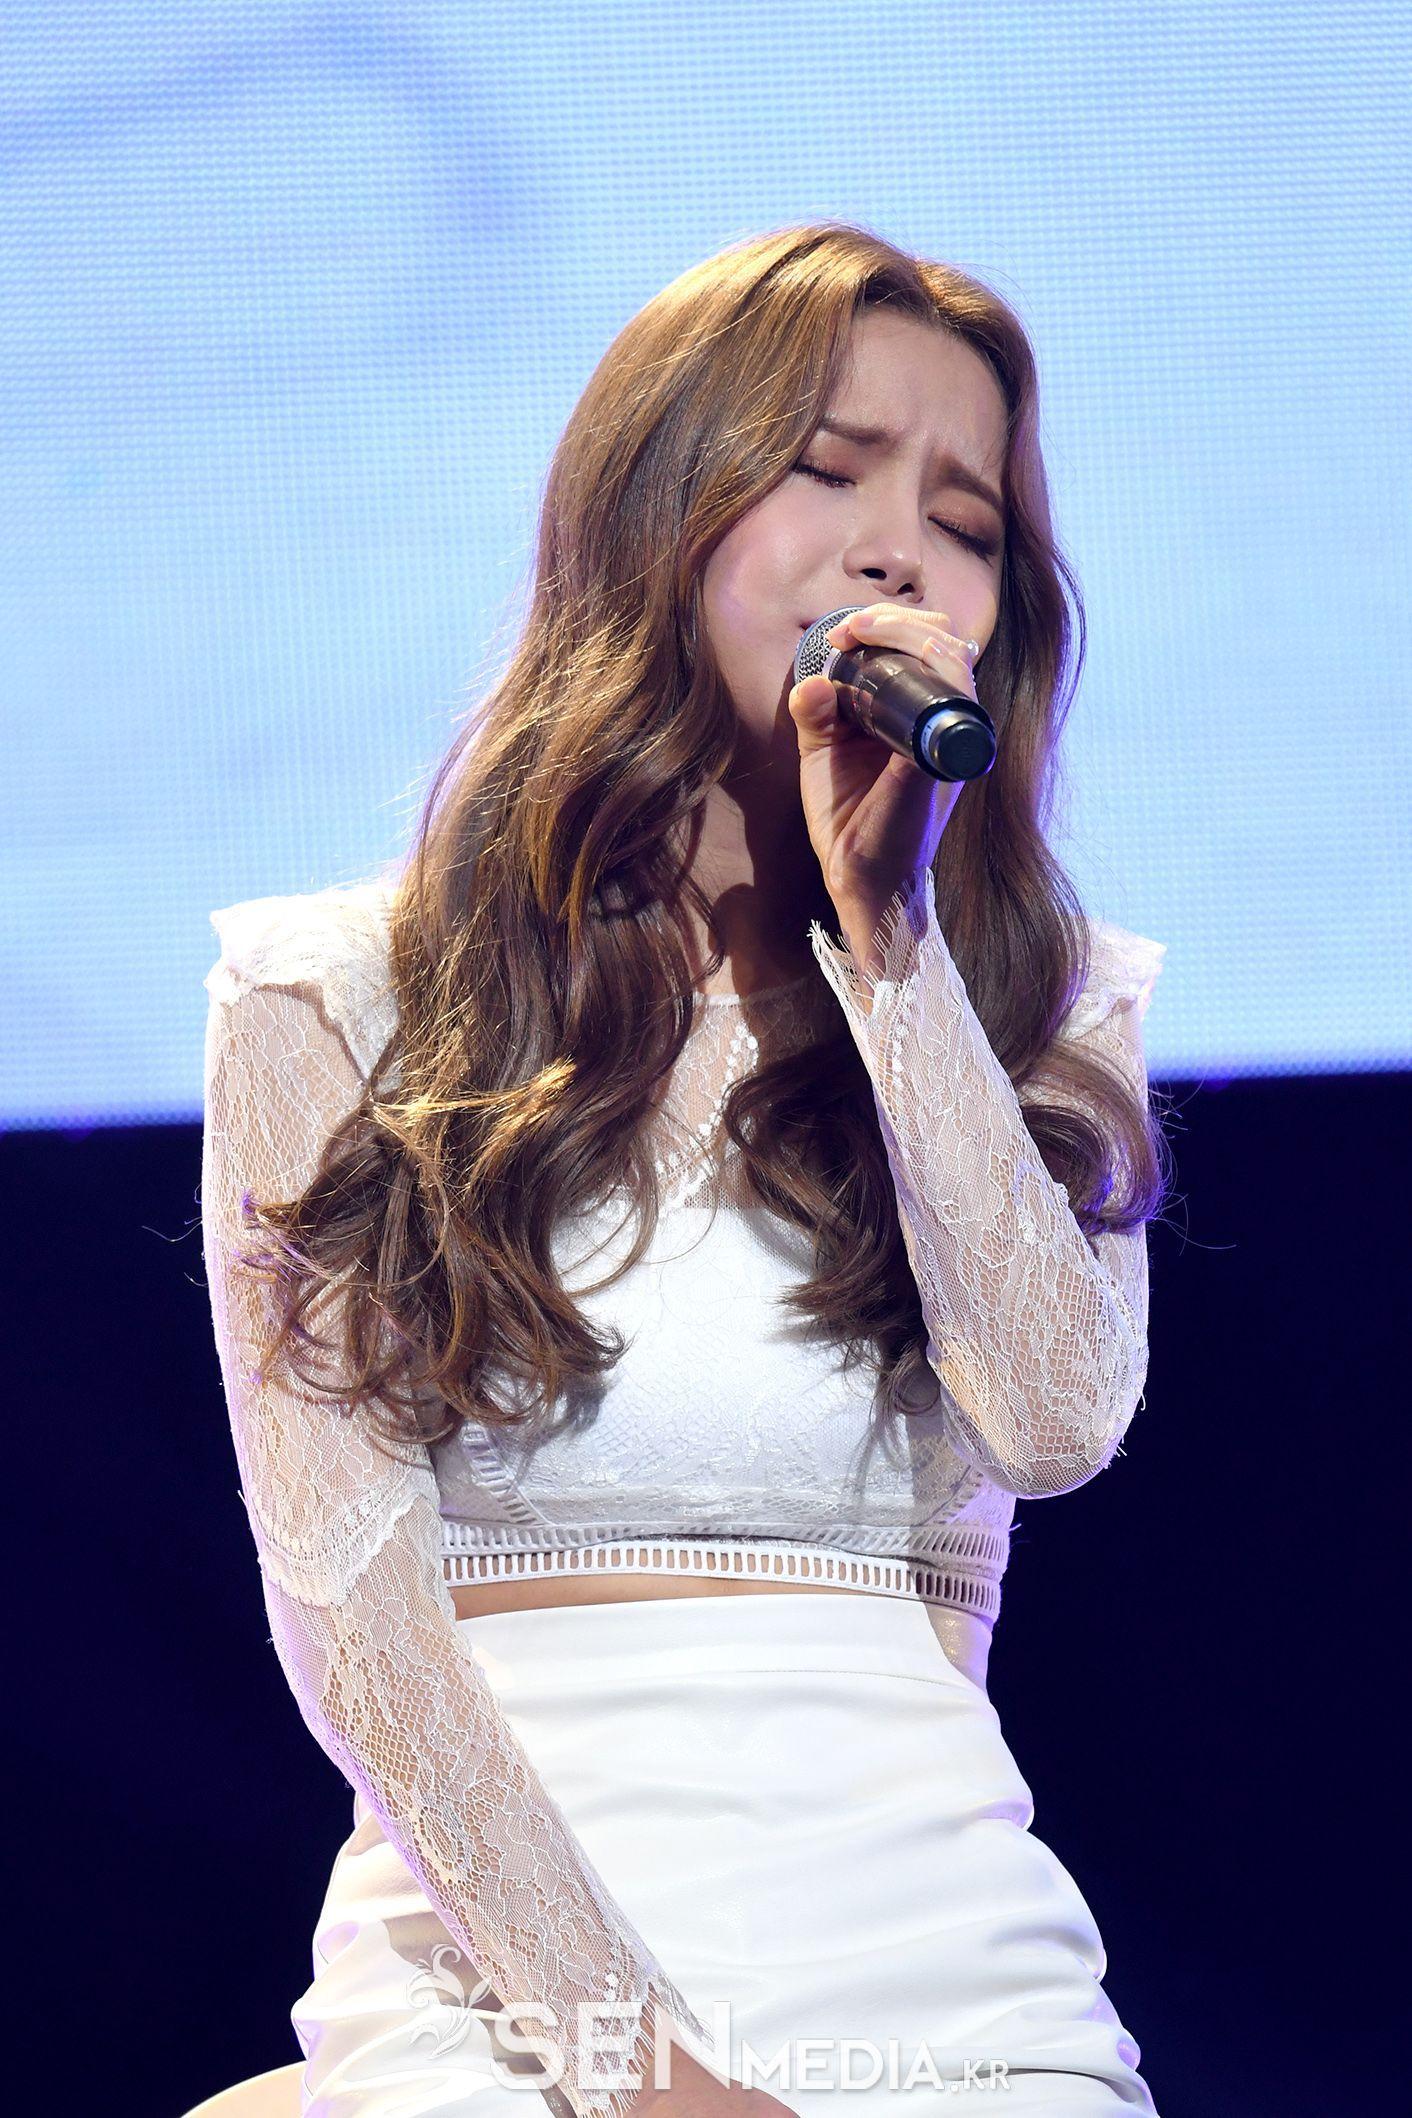 Korea Korean Kpop Idol Girl Band Group Mamamoo Solars Goddes Korean Hairstyles Band Girl God Korean Hairstyle Long Hair Styles Korean Hairstyle Long